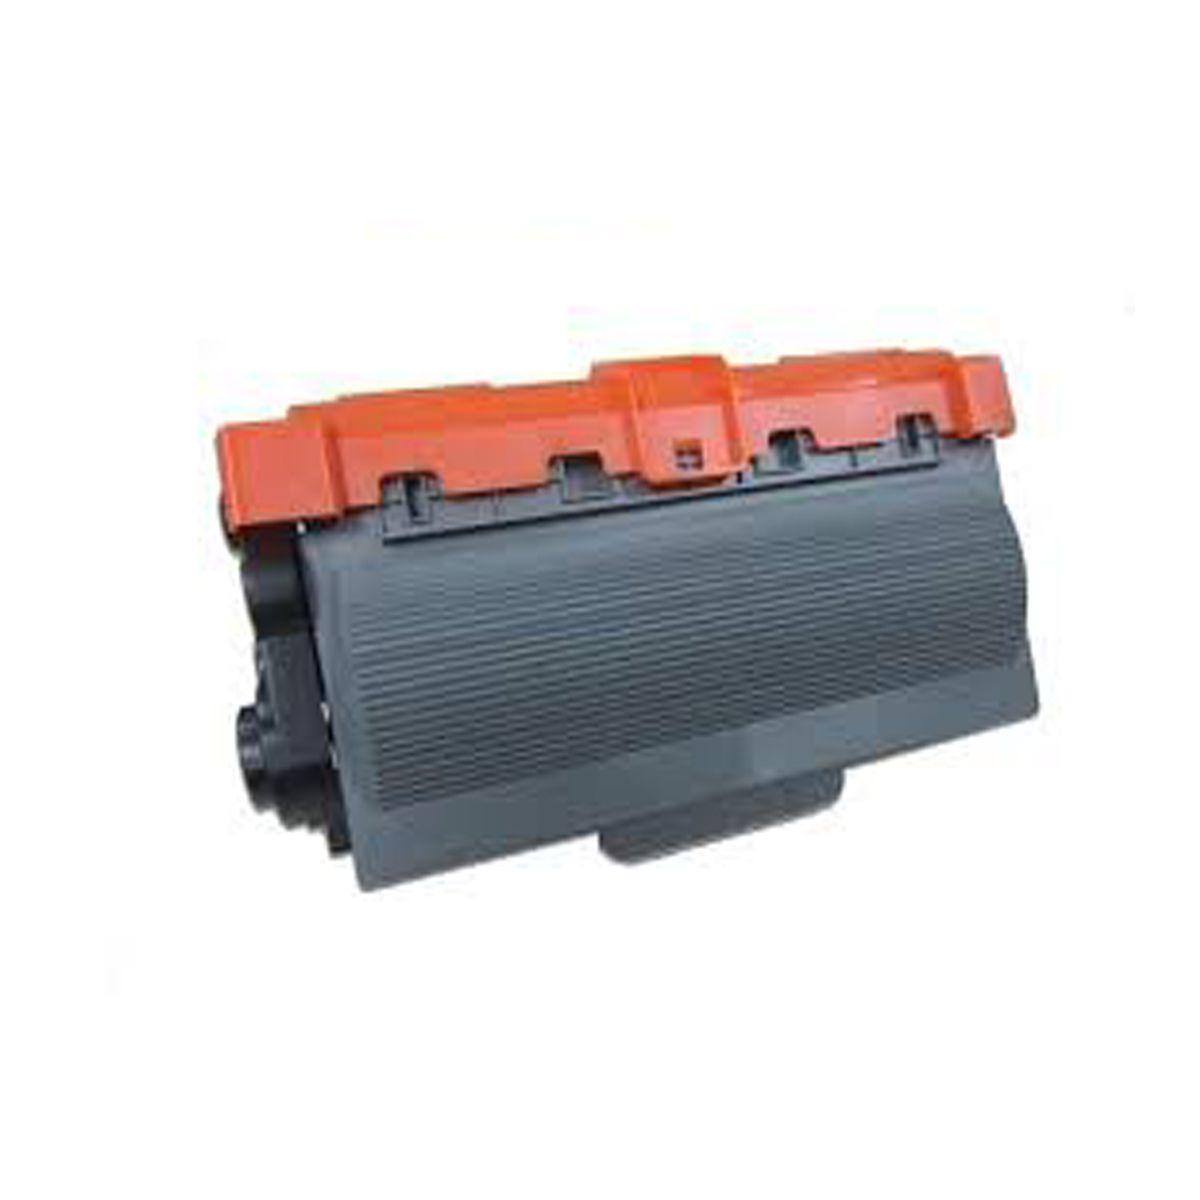 Toner Brother TN720 TN750 - DCP 8112DN 8152DN HL 5452DW 5472DW MFC 8512DN - Compatível - 8K